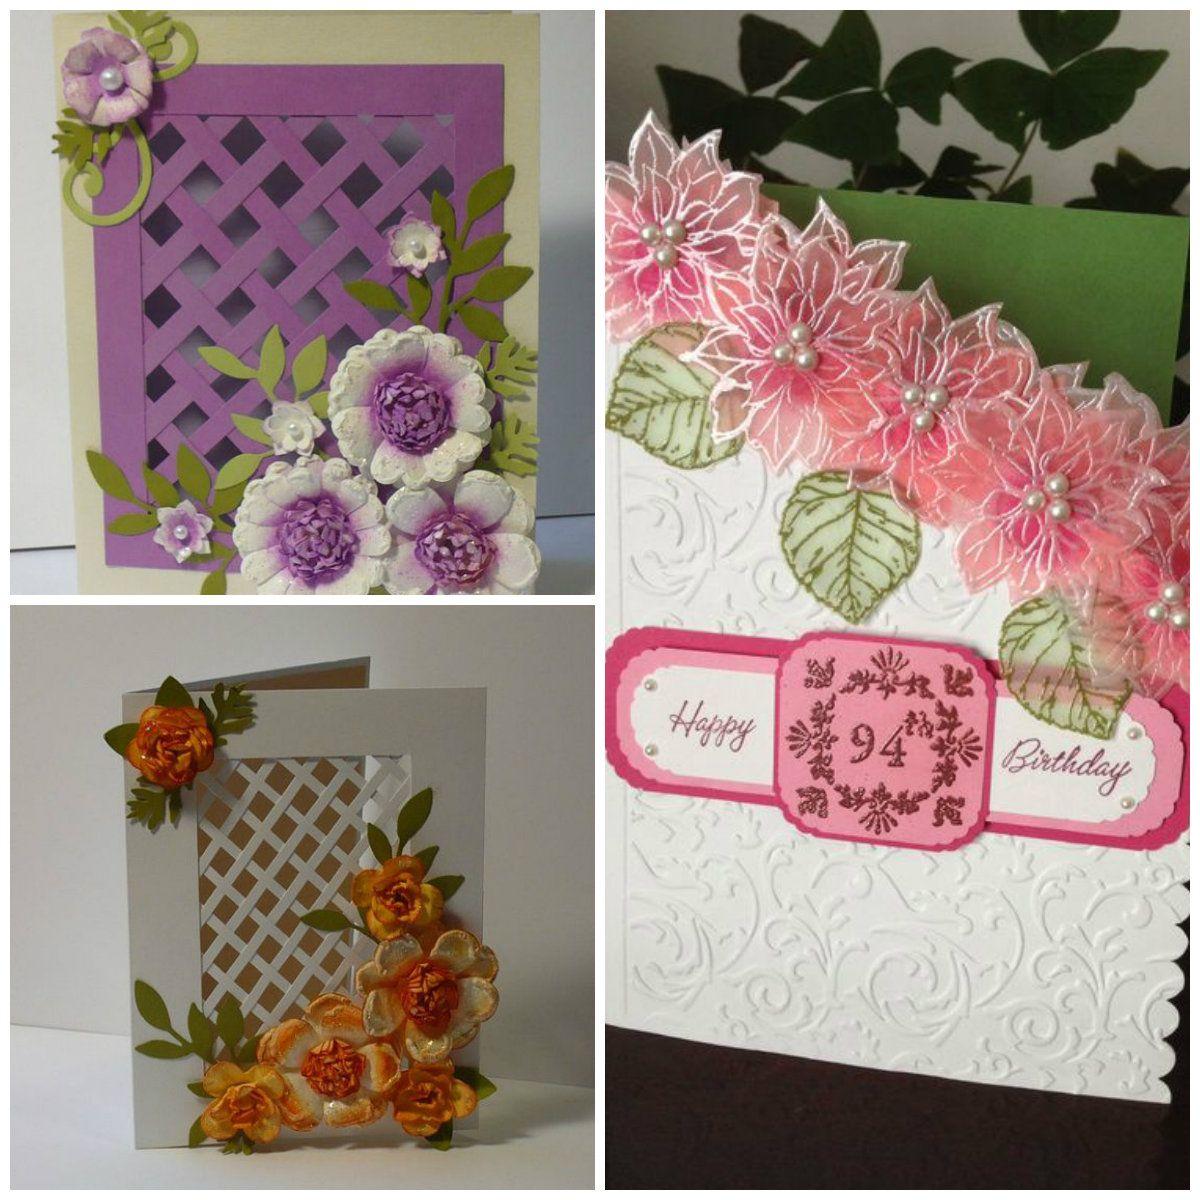 Floral homemade cards handmade christmas card ideas for husband